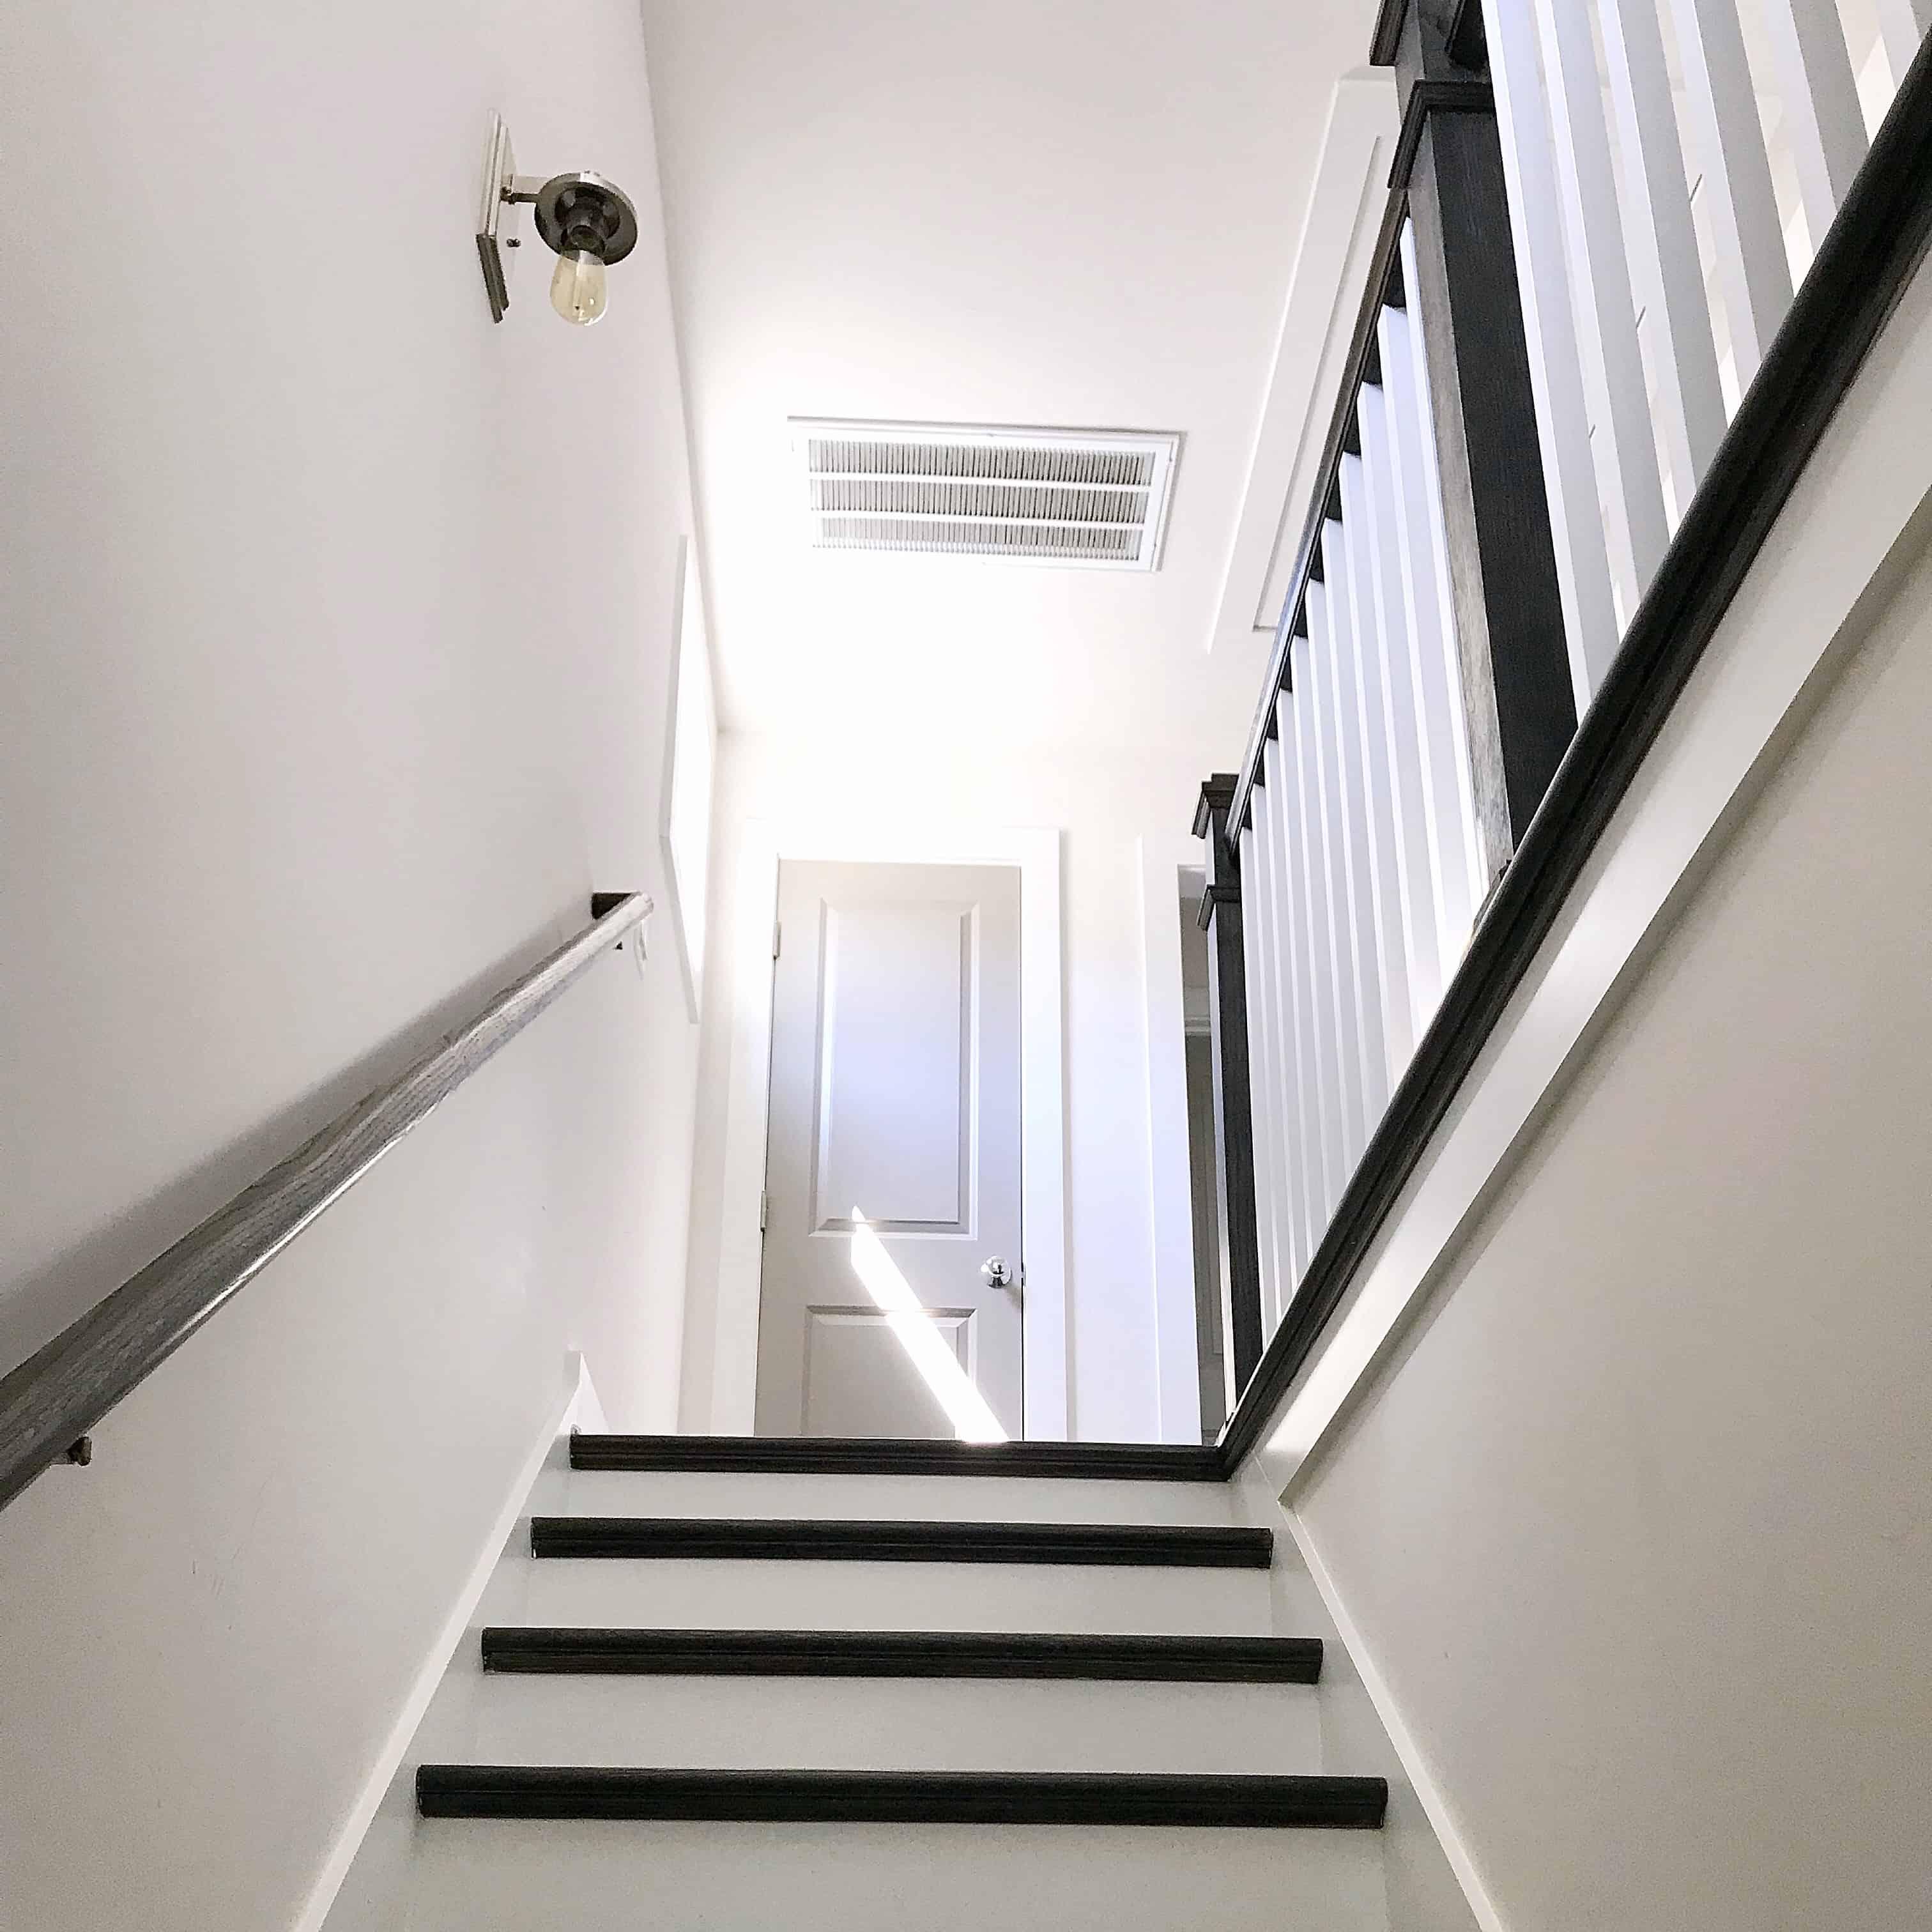 Light bright monochrome stairs